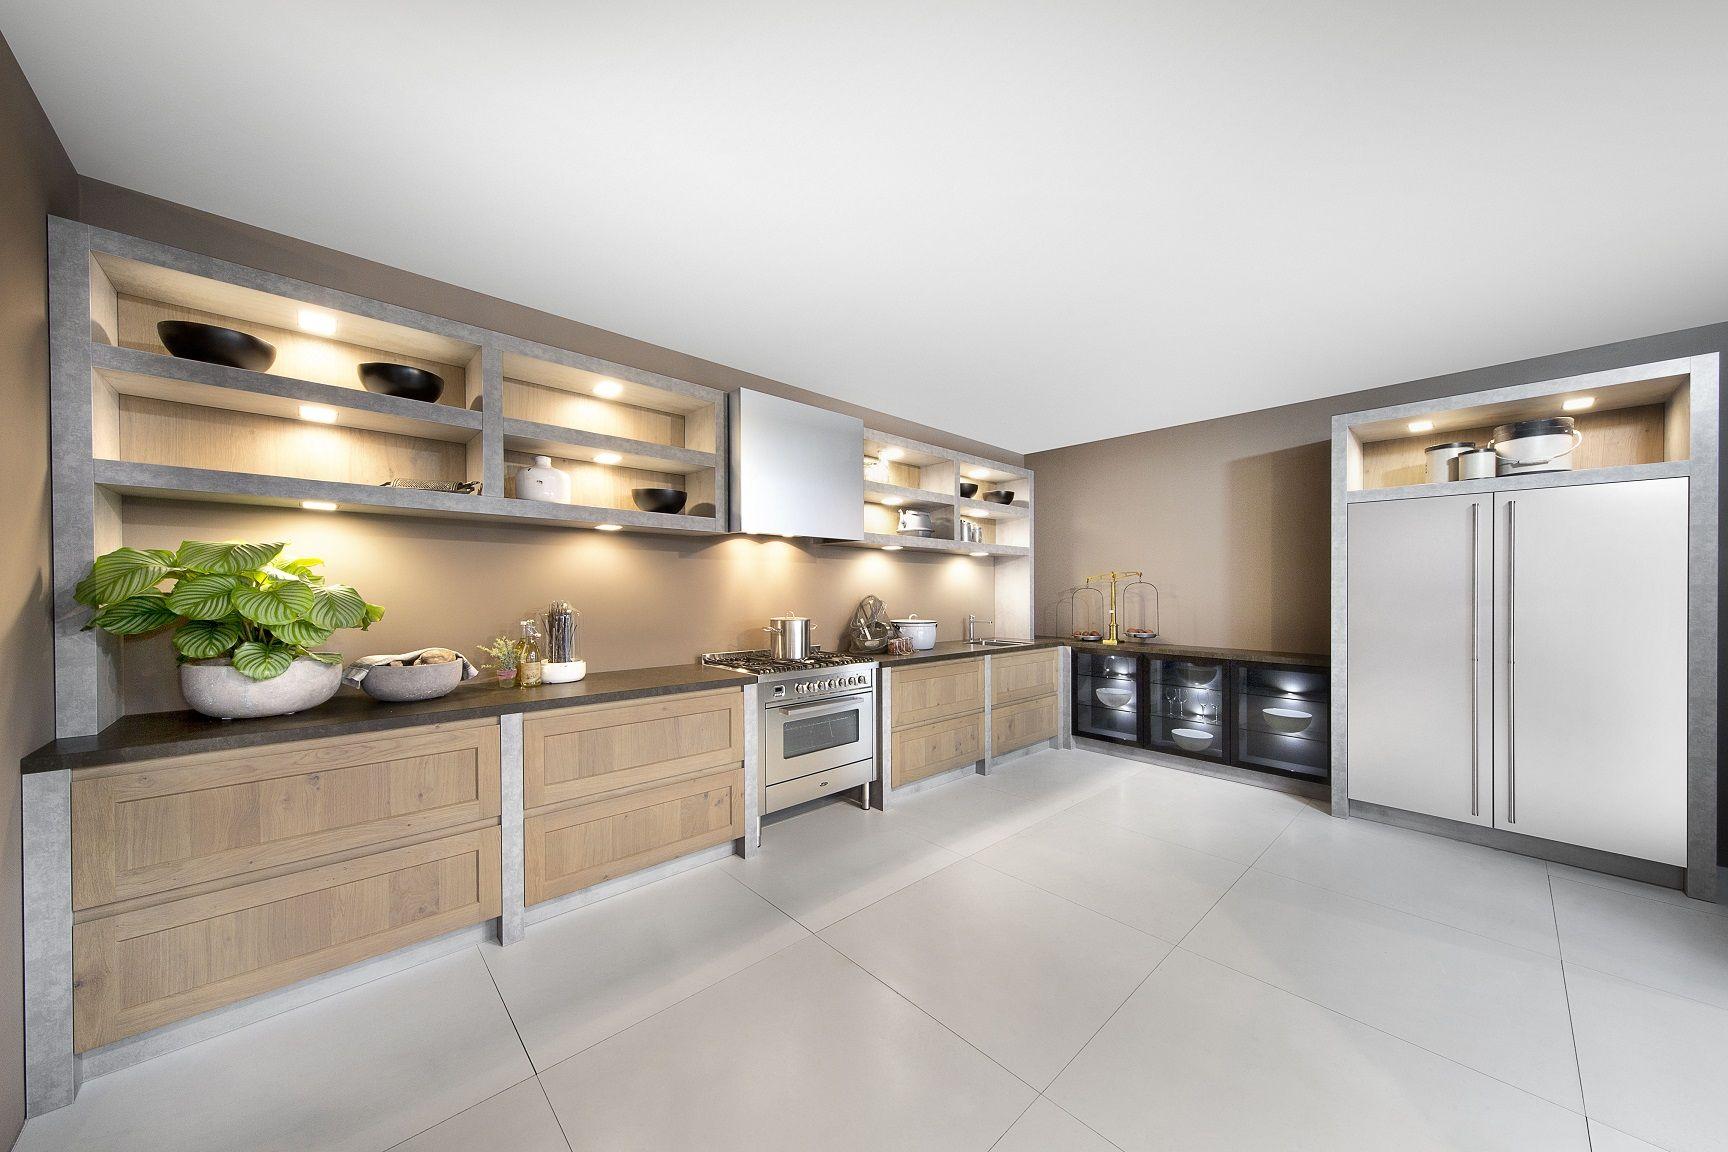 Moderne keuken hout. awesome awesome dsm keukens moderne keuken with